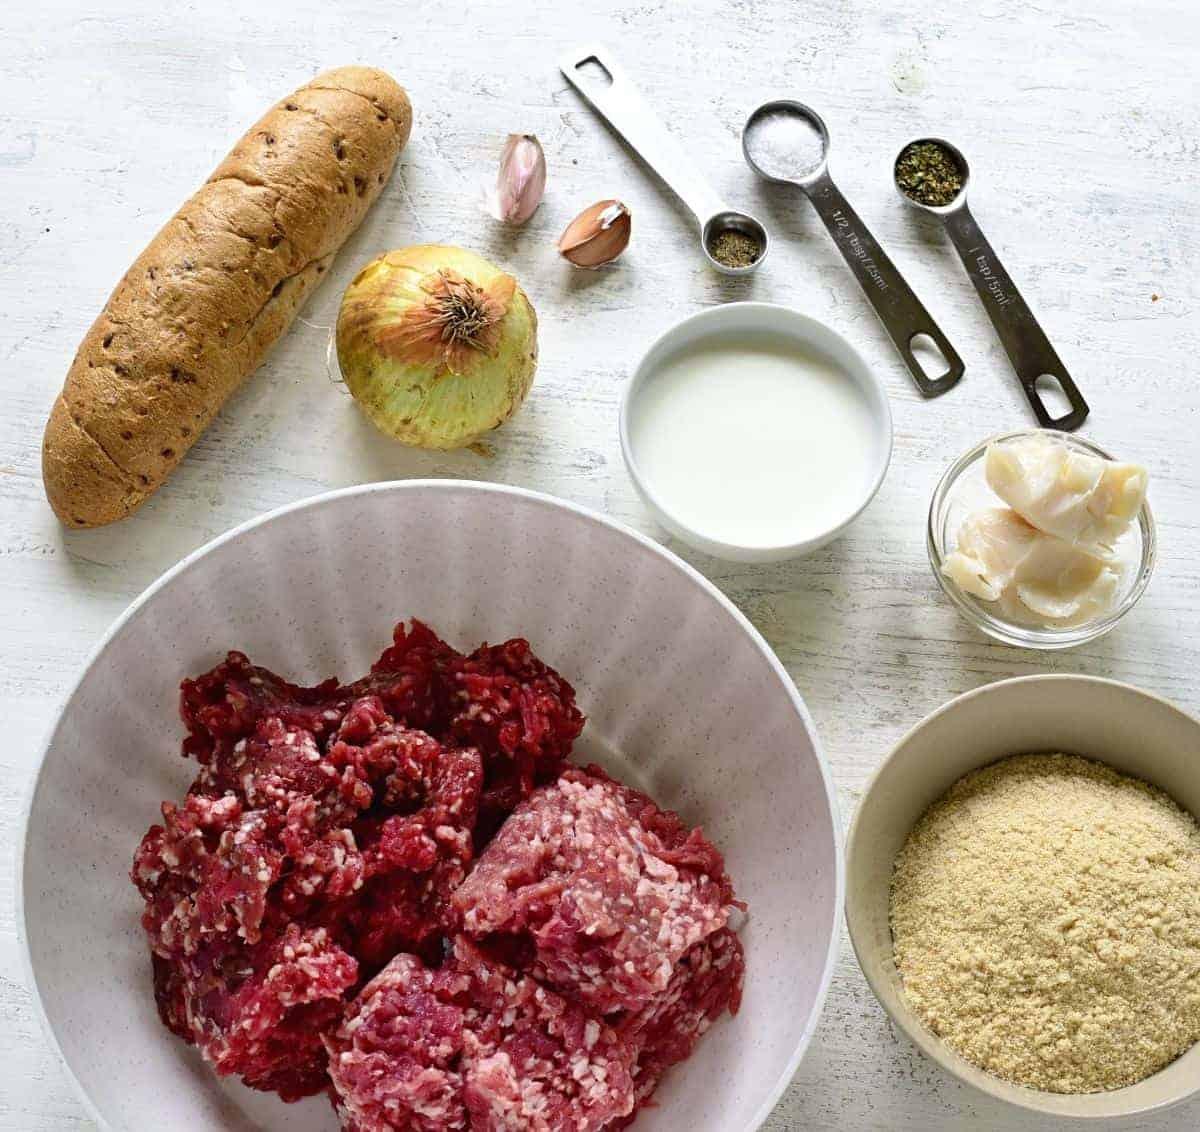 karbanatek ingredients